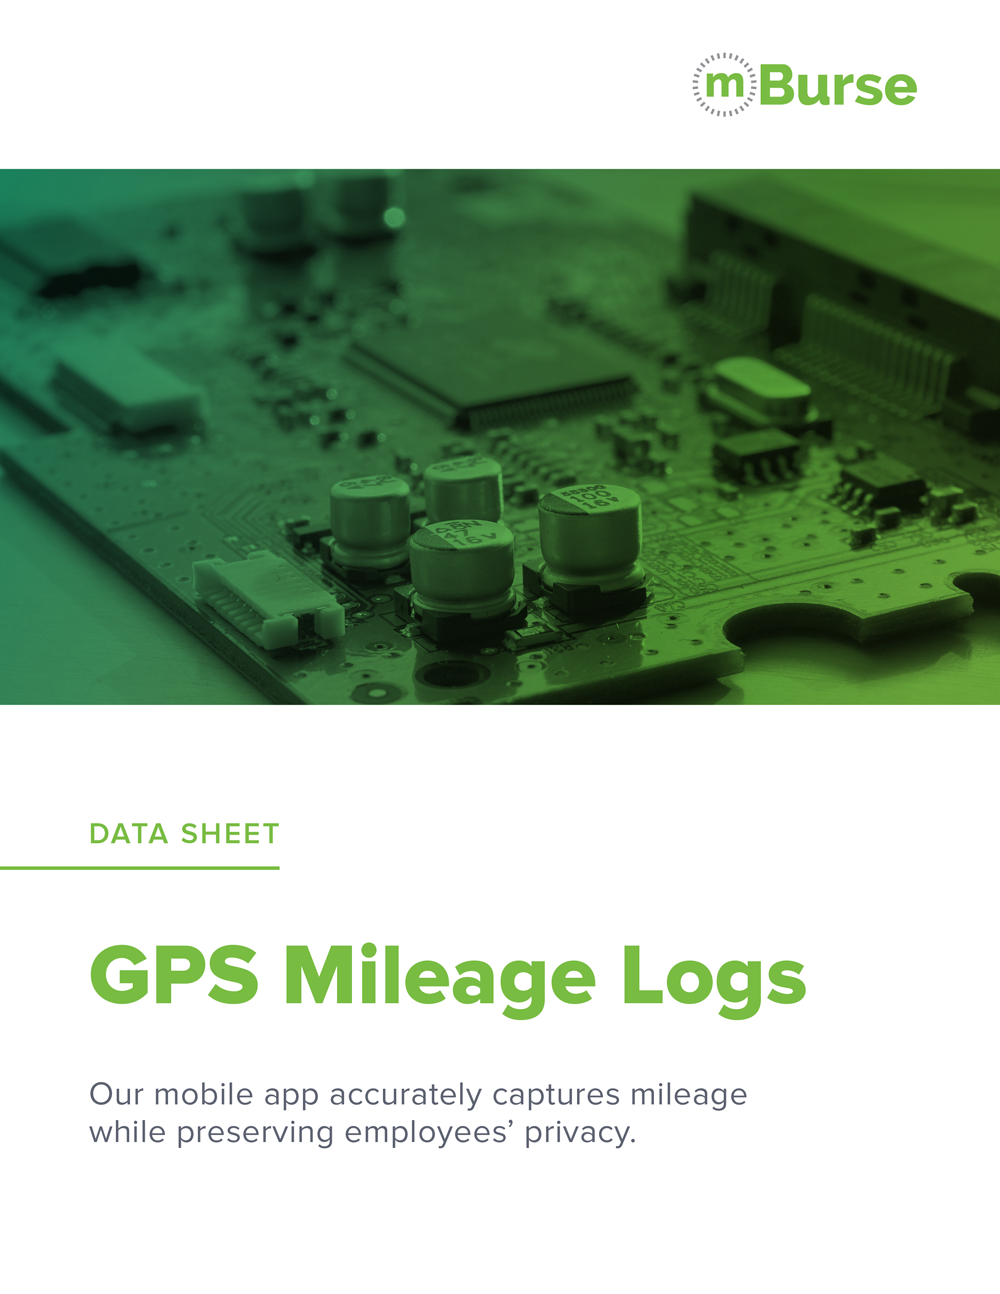 mBurse GPS Mileage Log data sheet